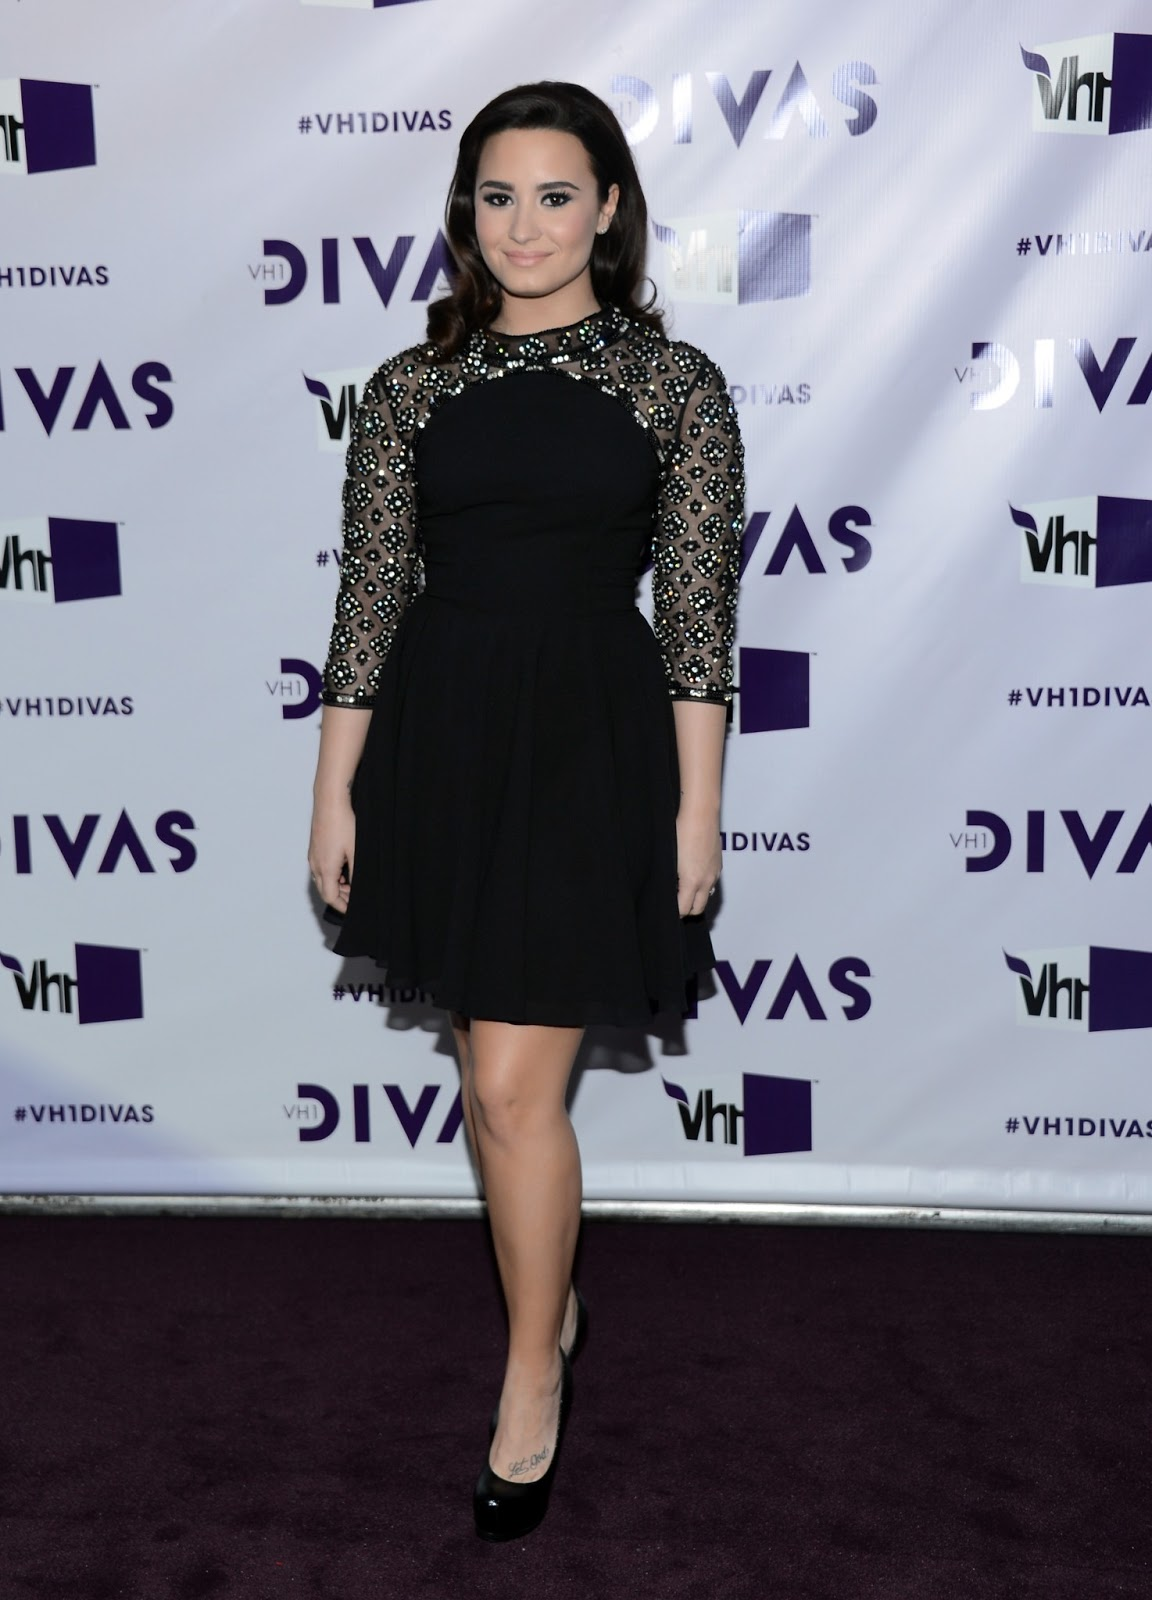 http://4.bp.blogspot.com/-ACLuHVPYILs/UPxHFG93MpI/AAAAAAAAPzg/R5jin0BriZg/s1600/Demi+Lovato+%2837%29.JPG